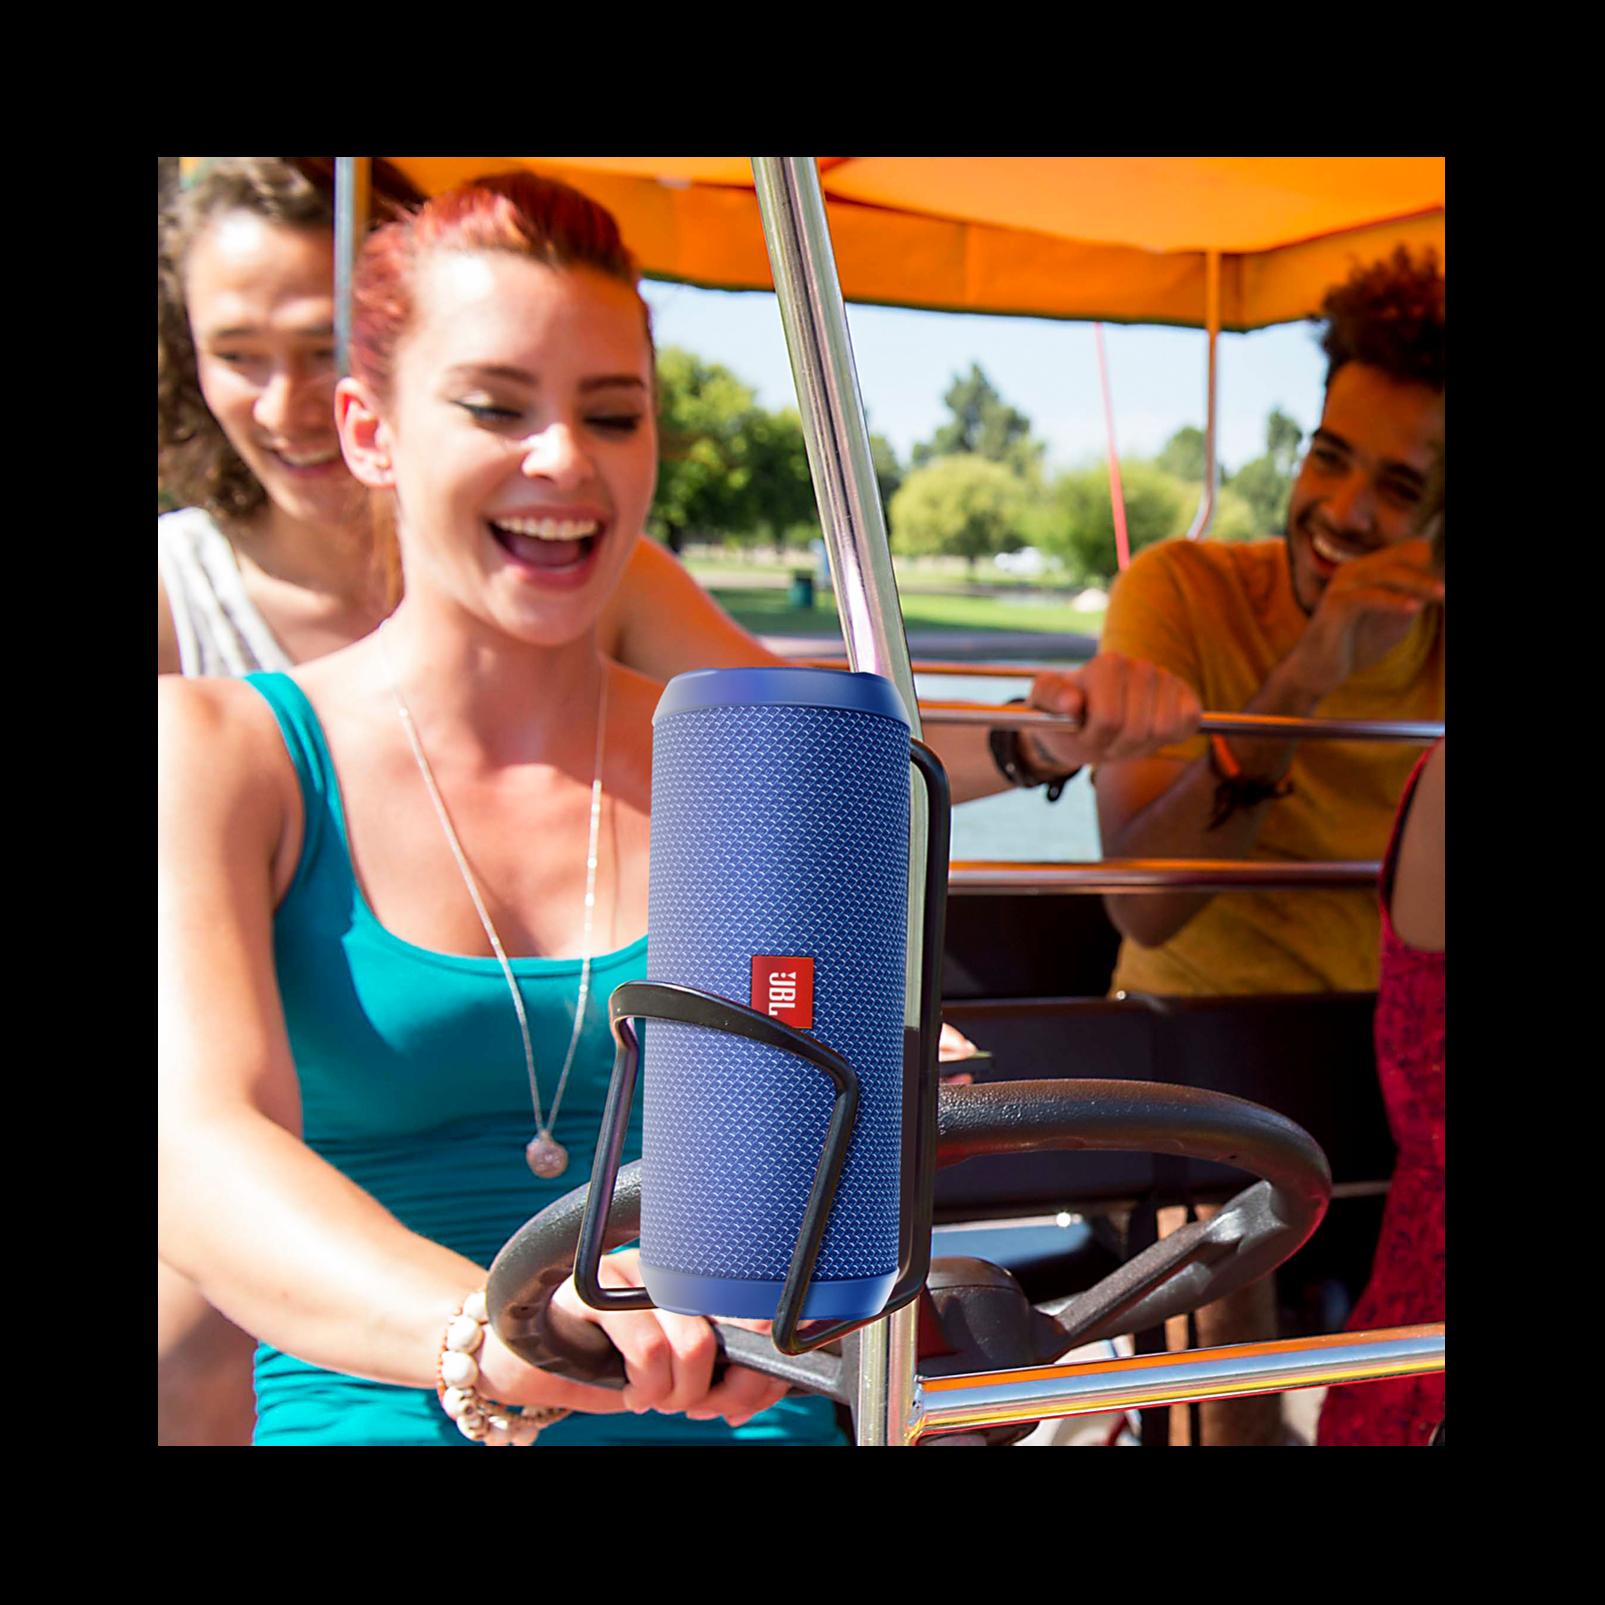 JBL Flip 3 - Blue - Splashproof portable Bluetooth speaker with powerful sound and speakerphone technology - Detailshot 7